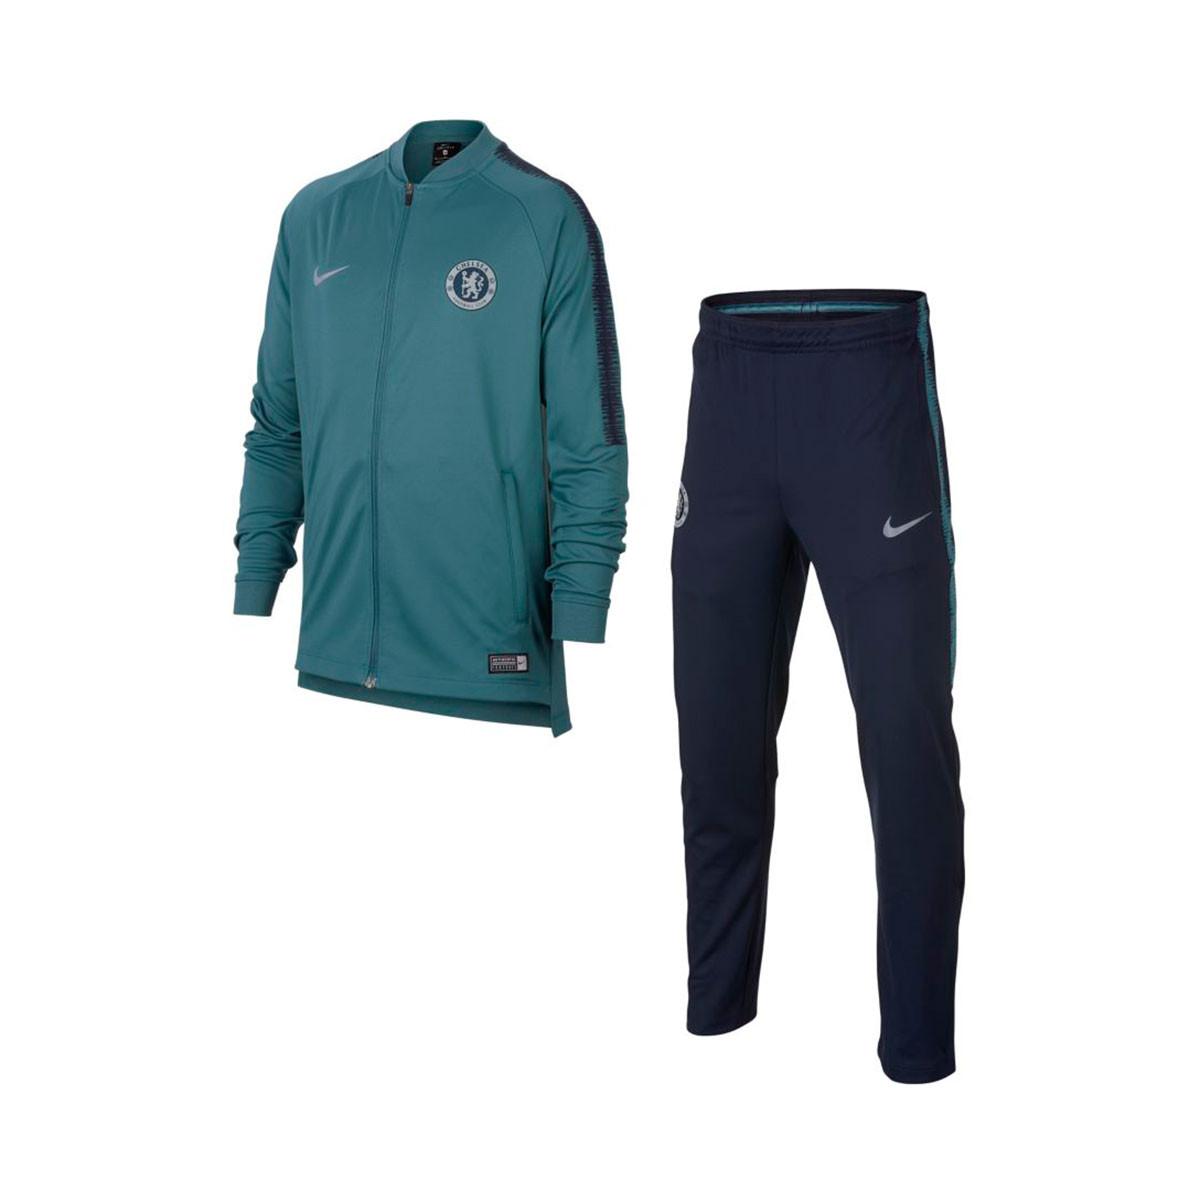 a958cb6fb3746 Tracksuit Nike Chelsea FC Squad 2018-2019 Niño Celestial teal-Obsidian -  Tienda de fútbol Fútbol Emotion